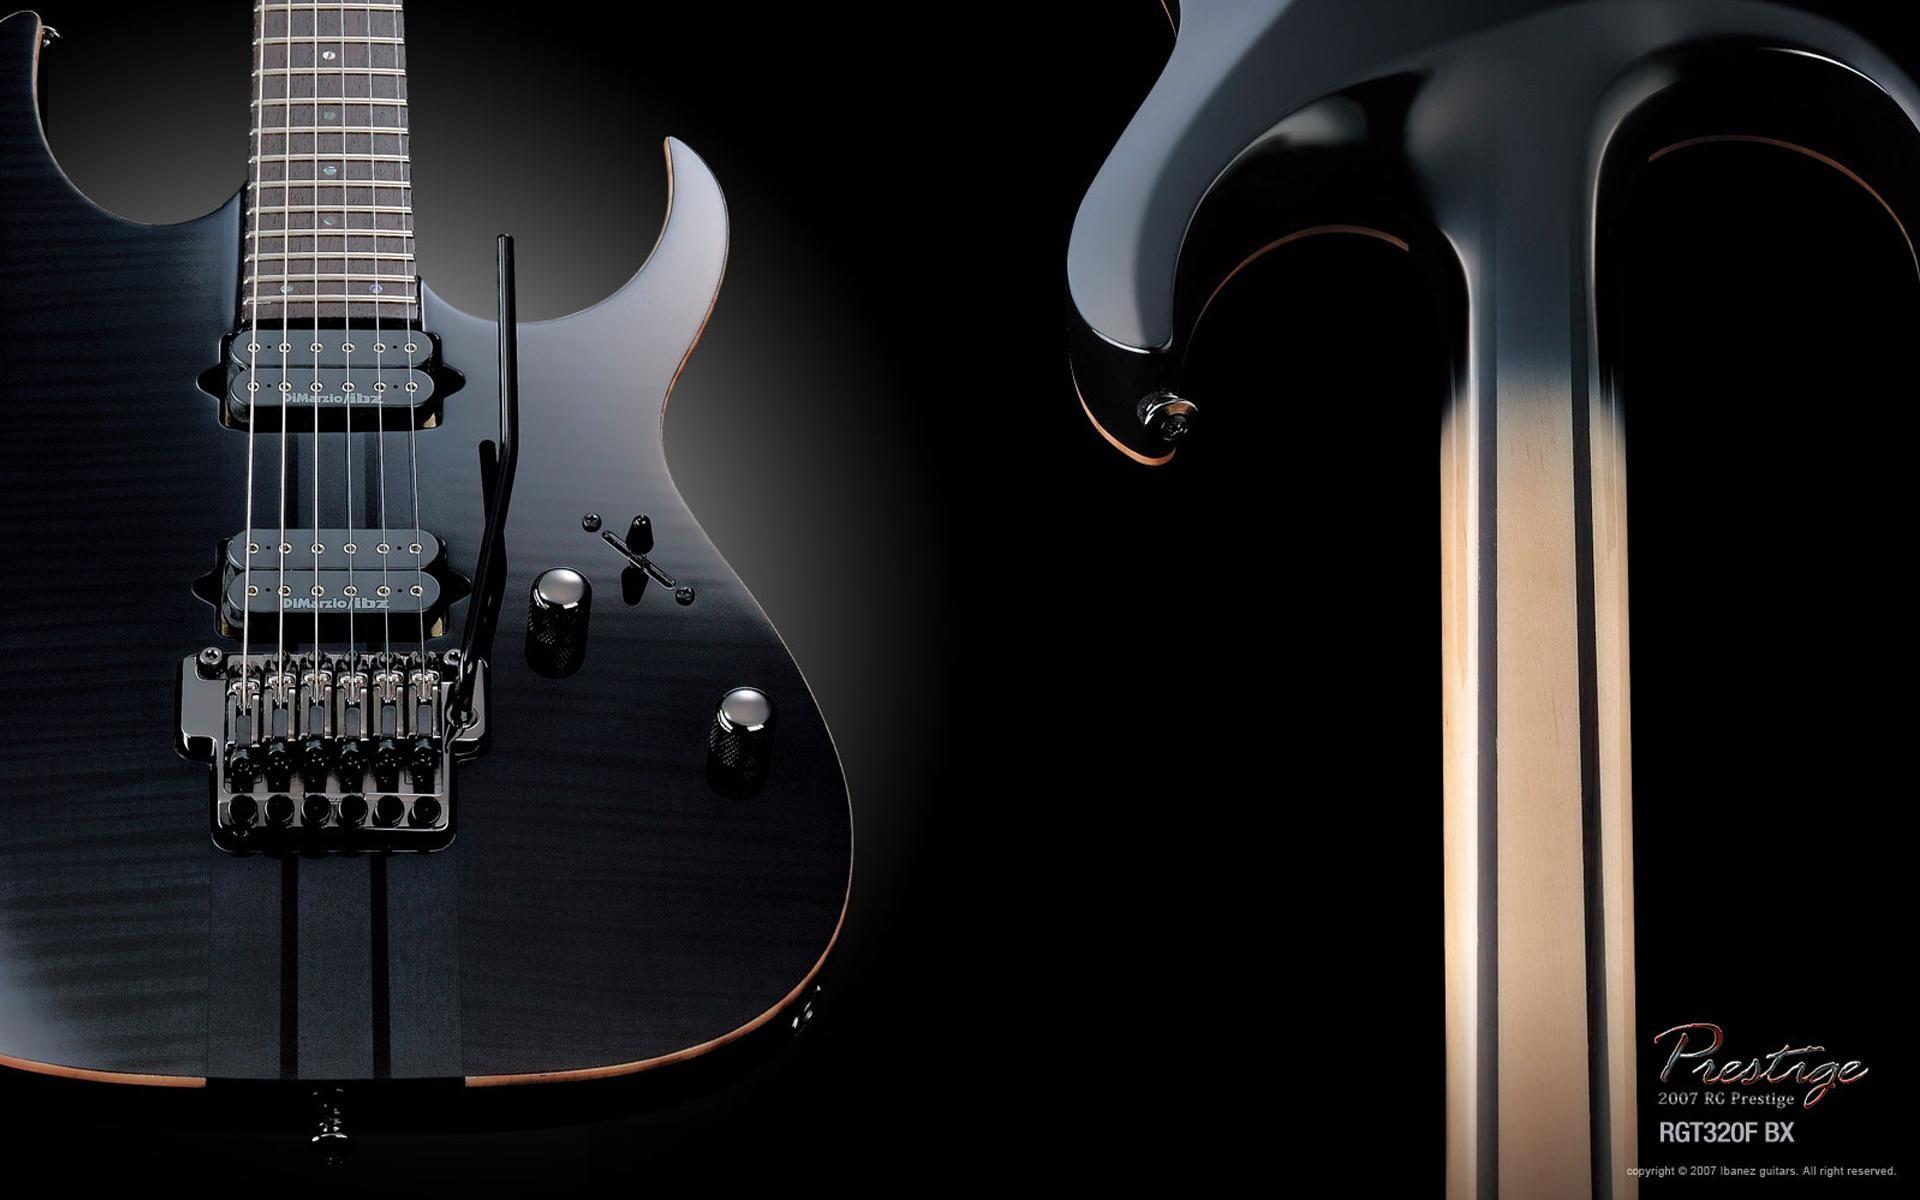 Guitar Ibanez Wallpaper 13366 Hd Wallpapers in Music – Imagesci.com